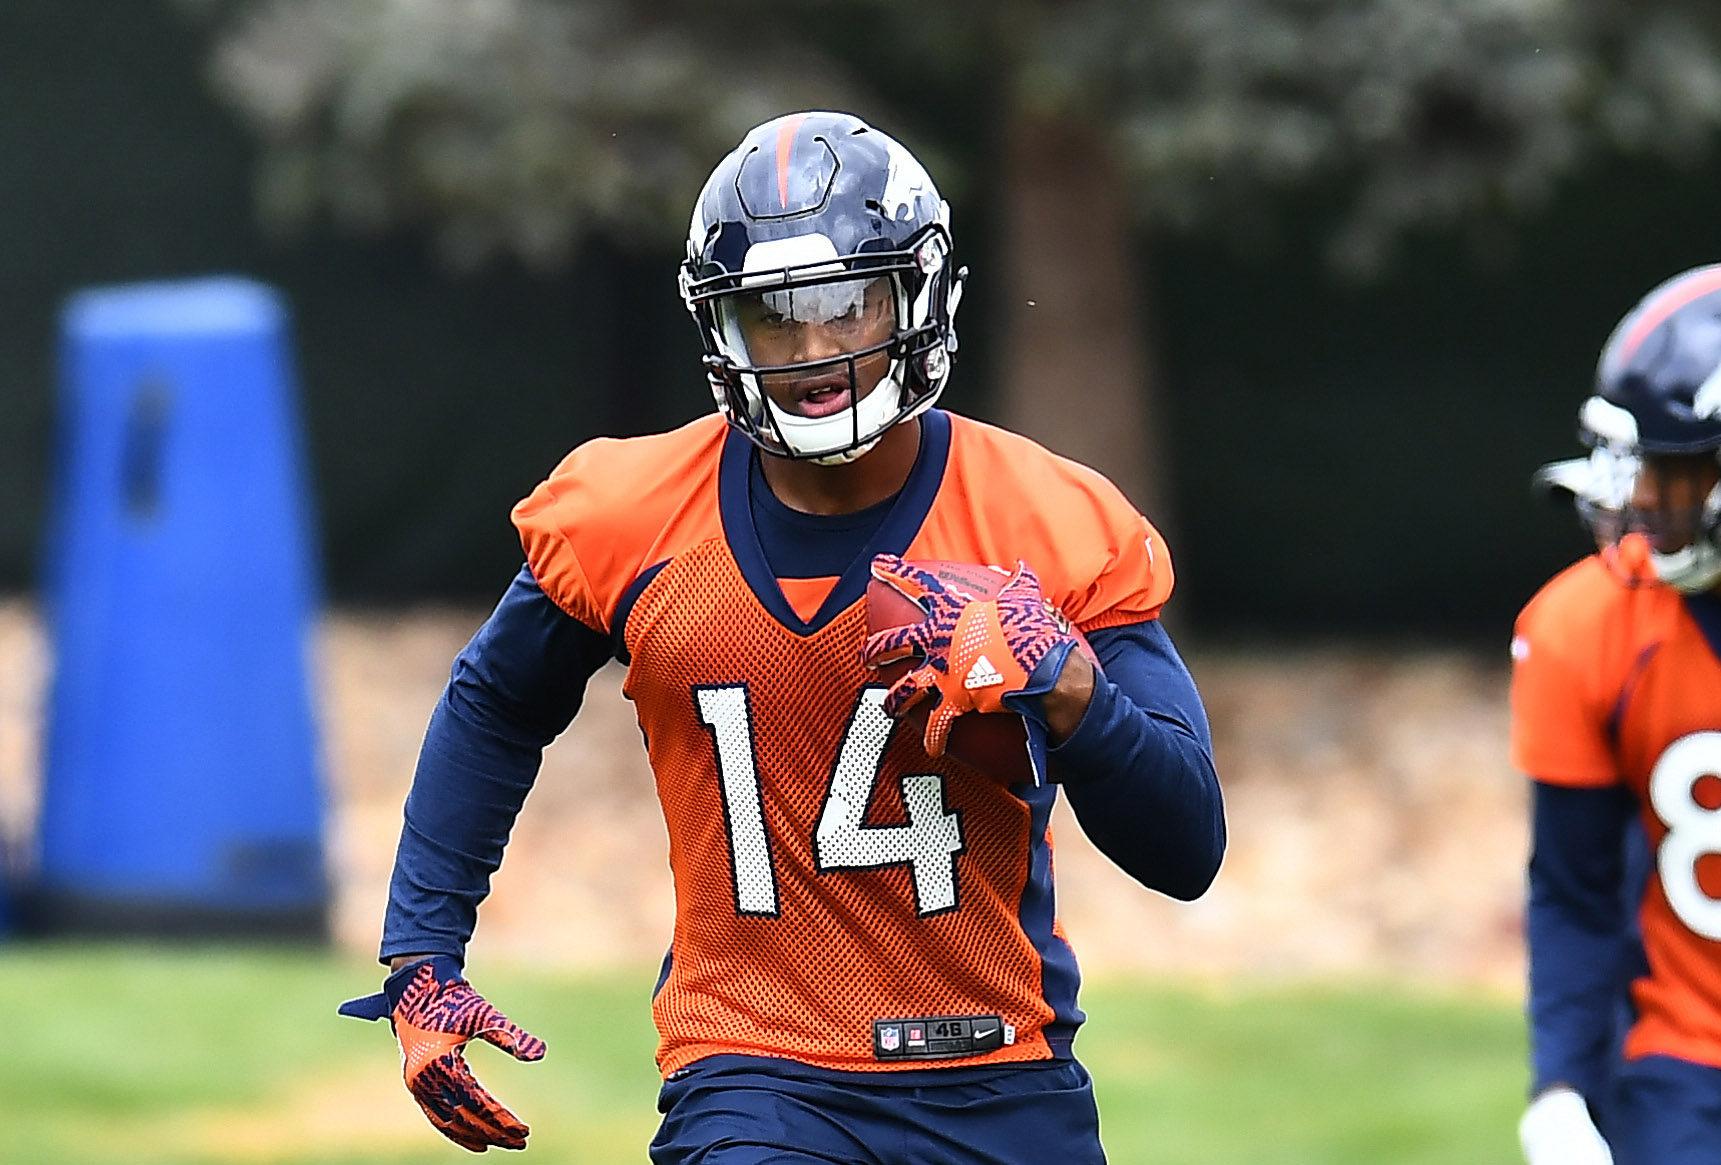 Denver Broncos wide receiver Courtland Sutton (14) participates in drills during rookie minicamp at the UCHealth Training Center.